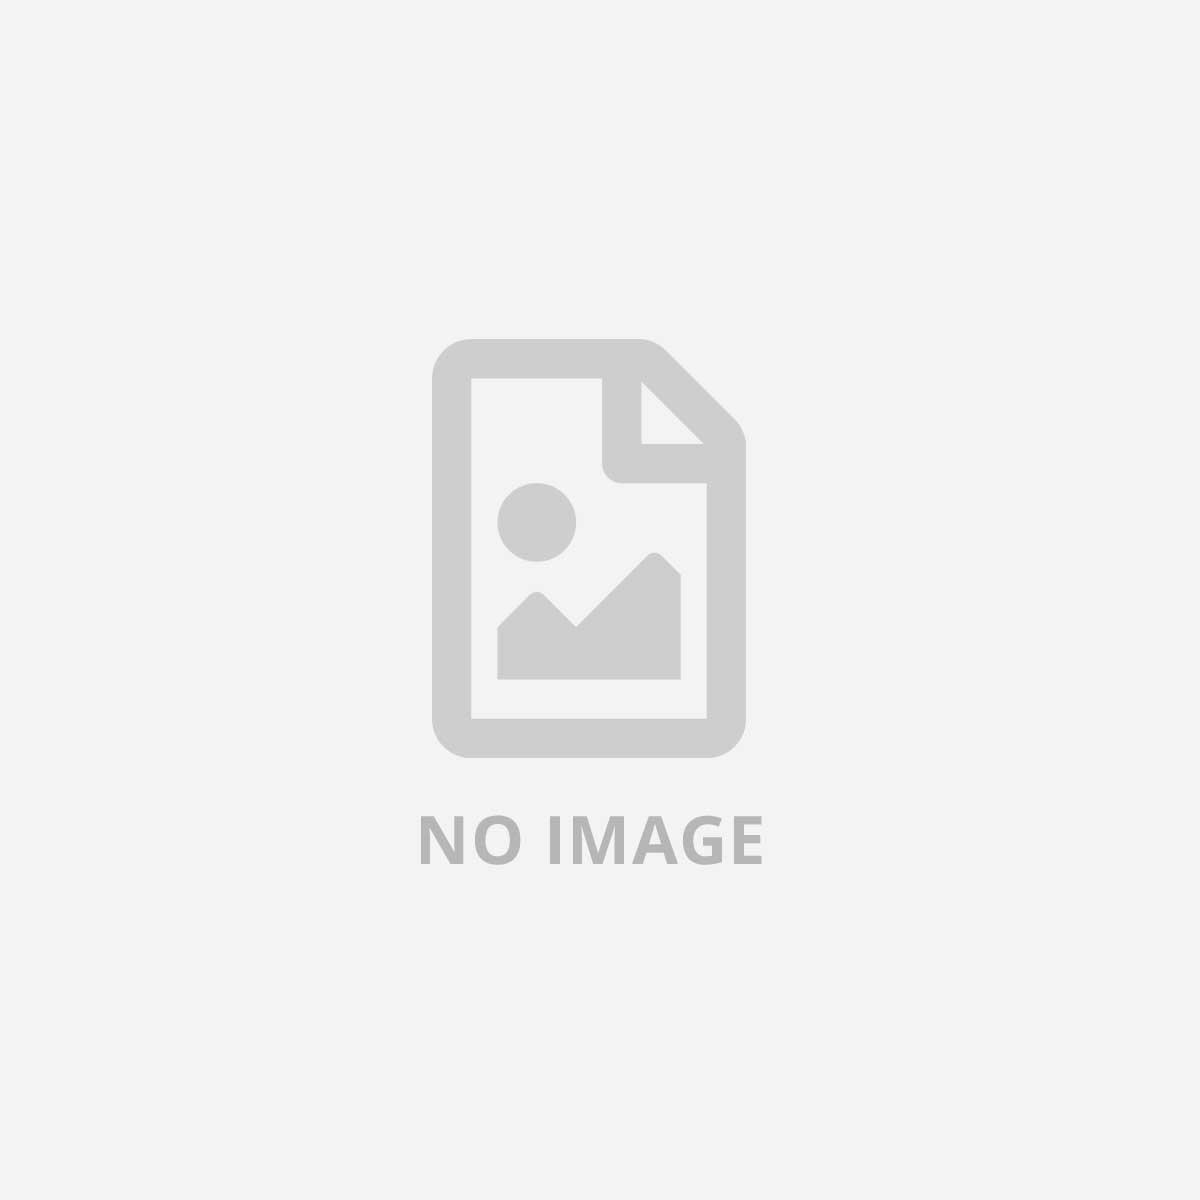 NILOX PCI EXPRESS ADAPTER 2SER+1PAR PORTS